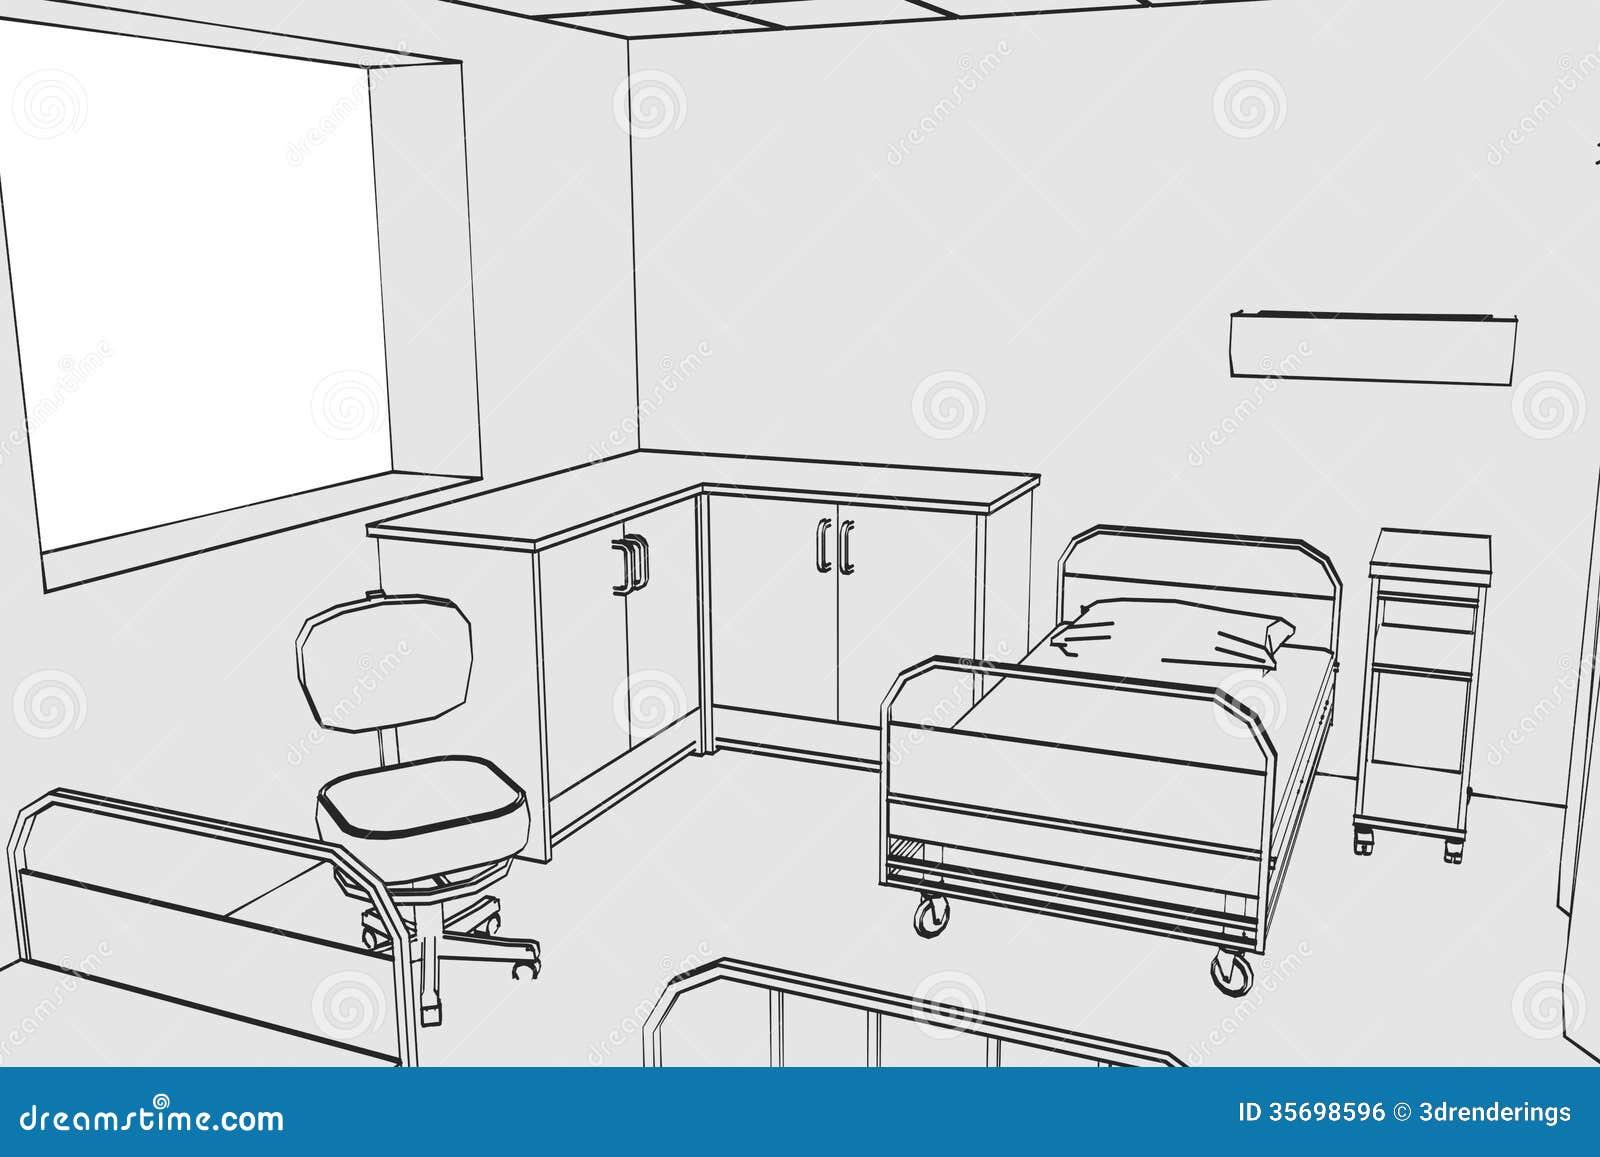 Cartoon Room: Image Of Hospital Room Royalty Free Stock Image